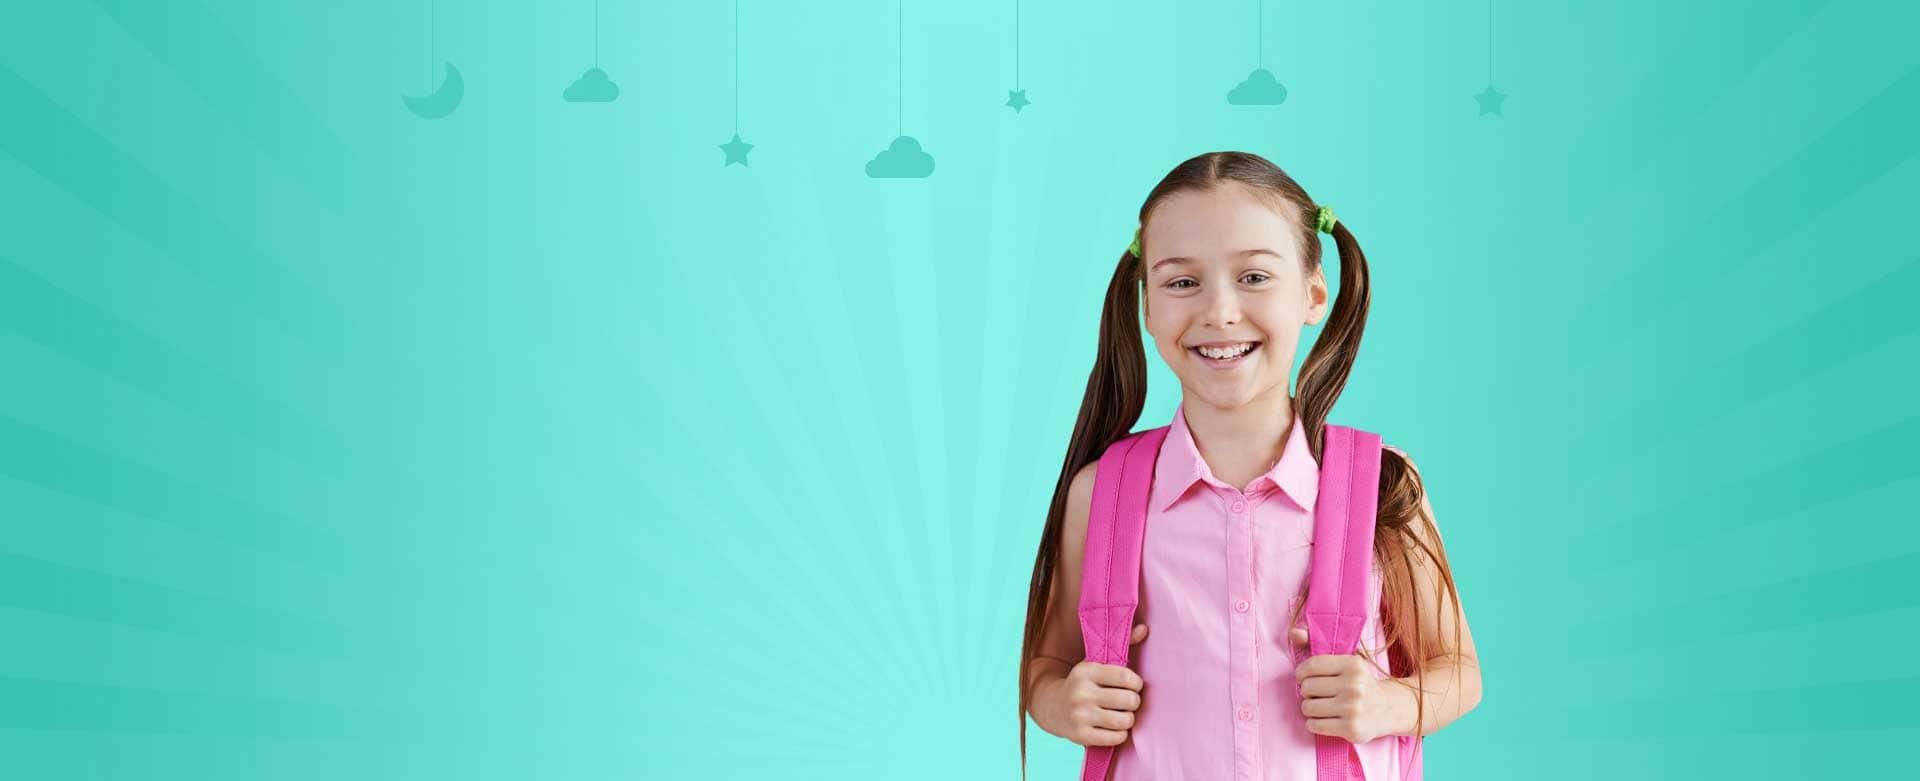 تدریس خصوصـی دبستان، معلم خصوصی دبستان| حضوری+آنلاین